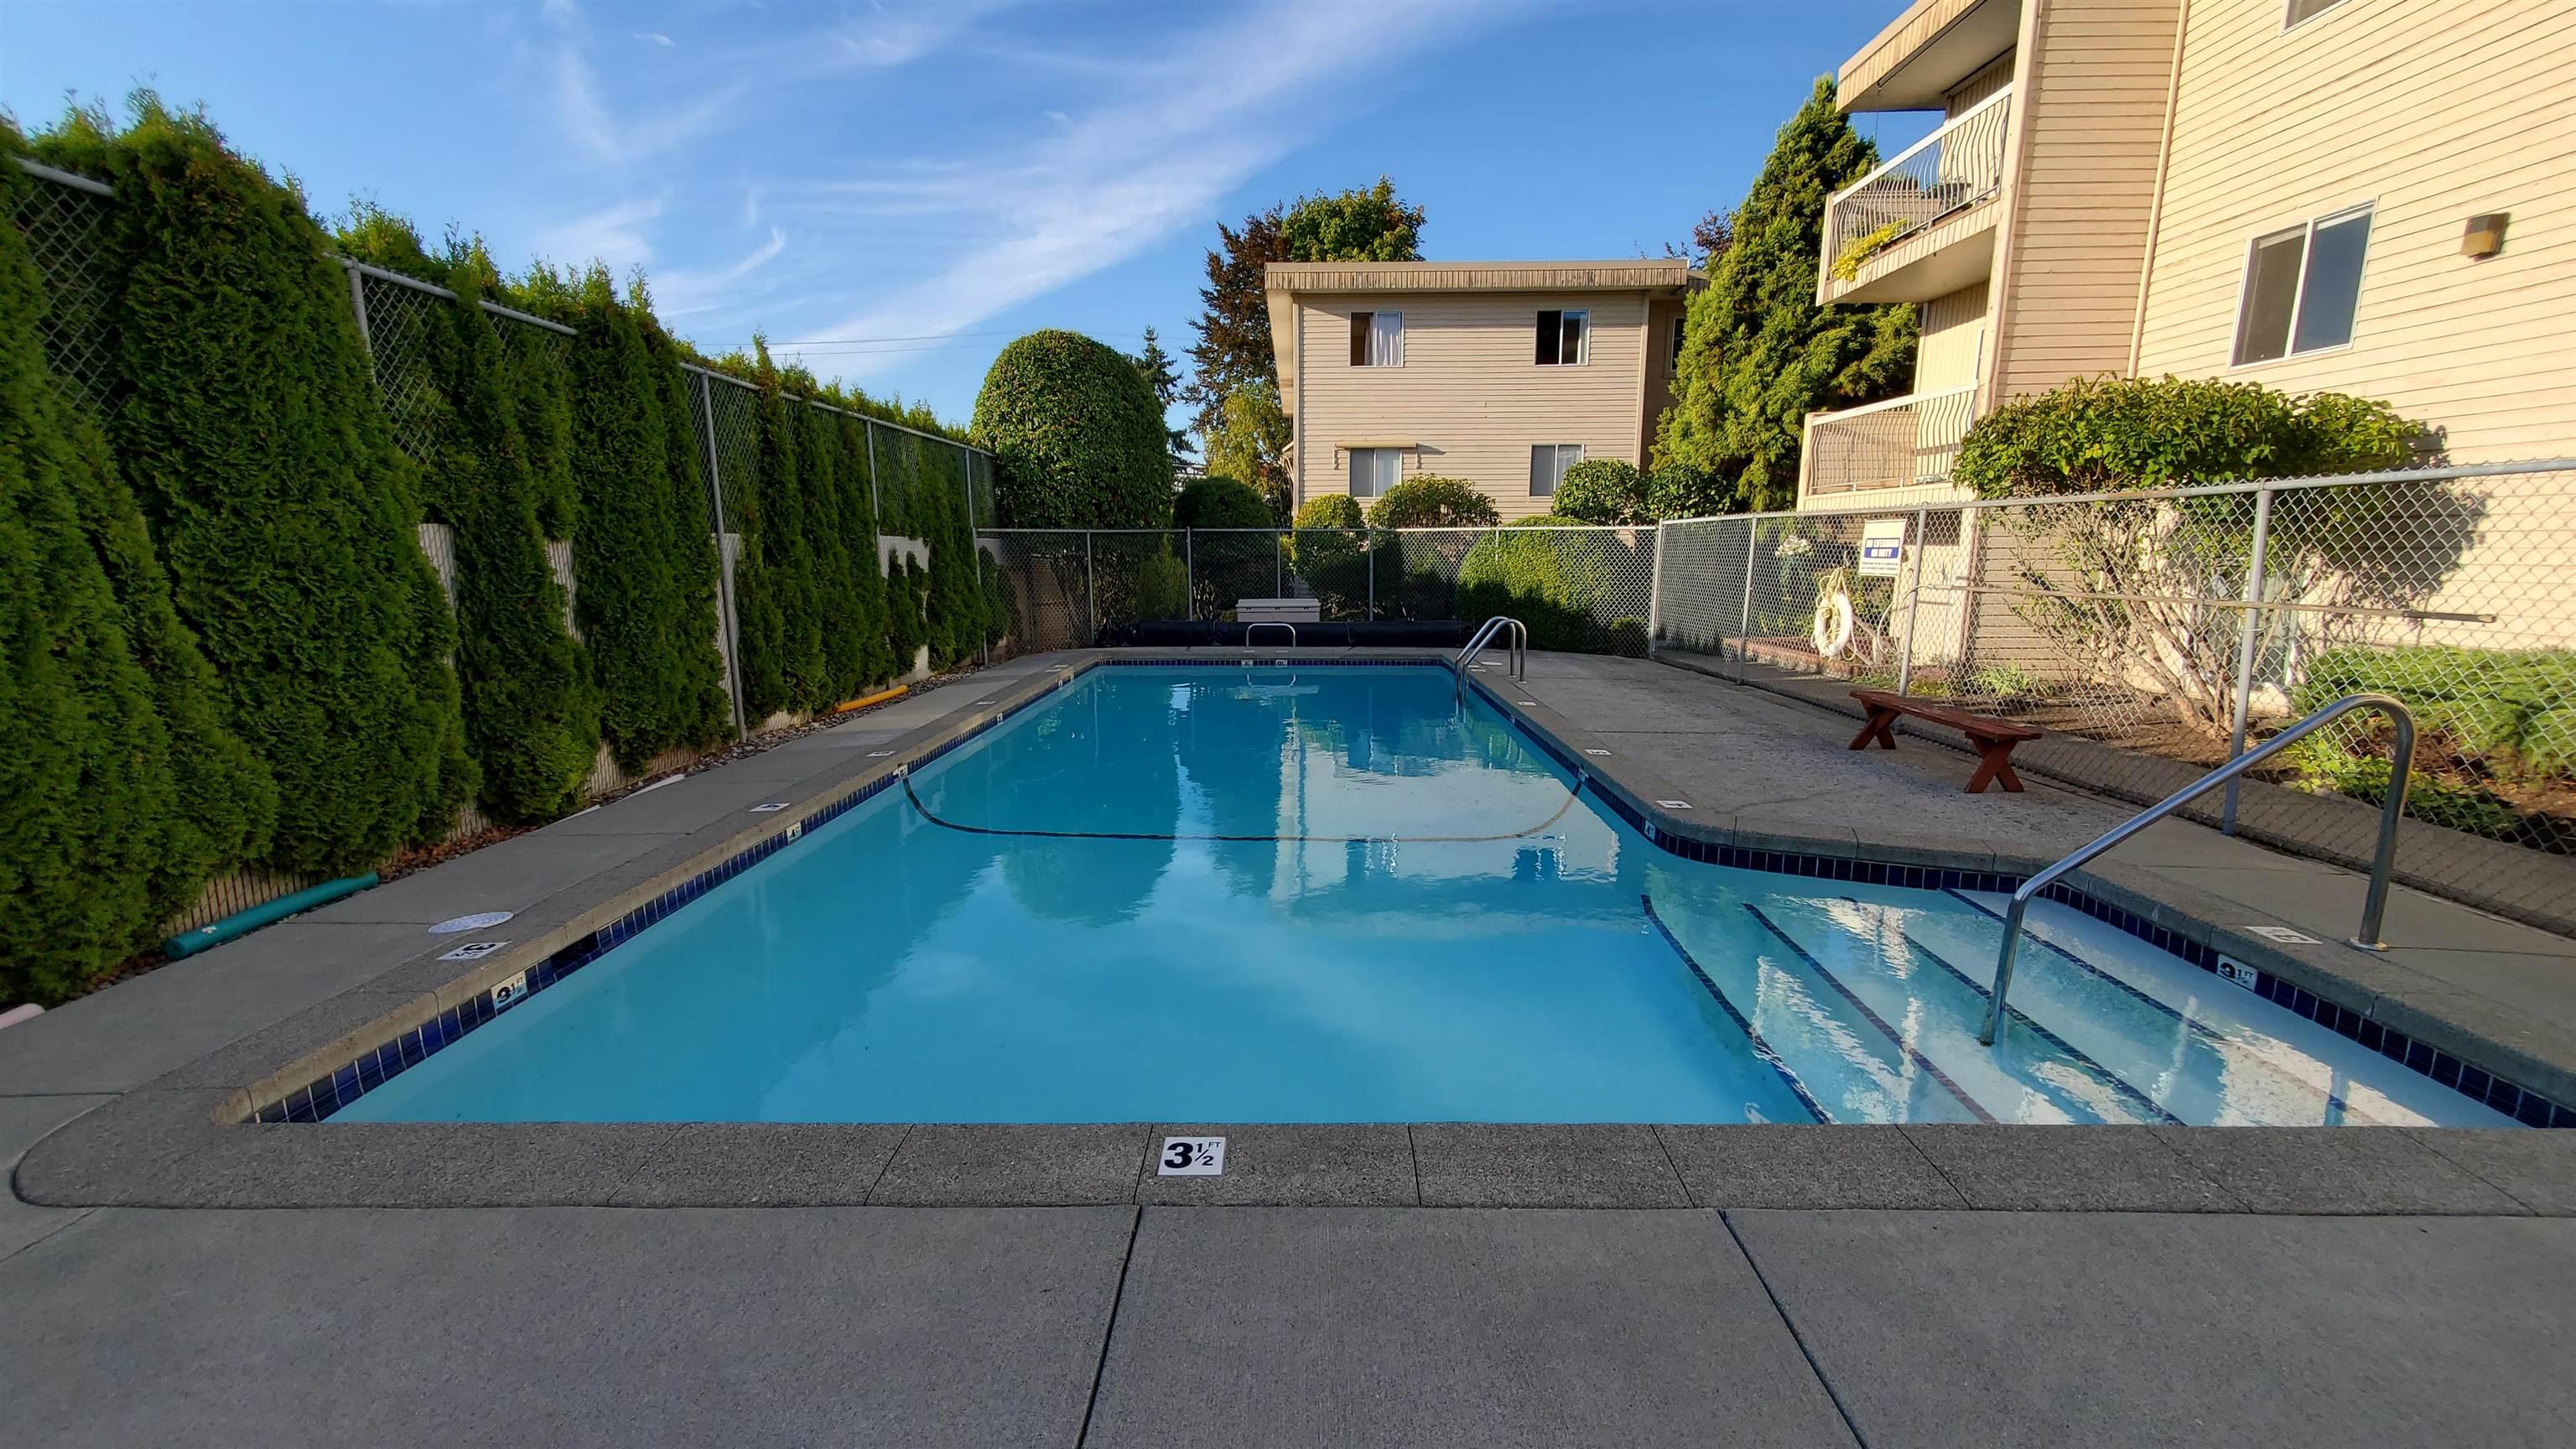 120 11806 88 AVENUE - Annieville Apartment/Condo for sale, 2 Bedrooms (R2616862) - #12